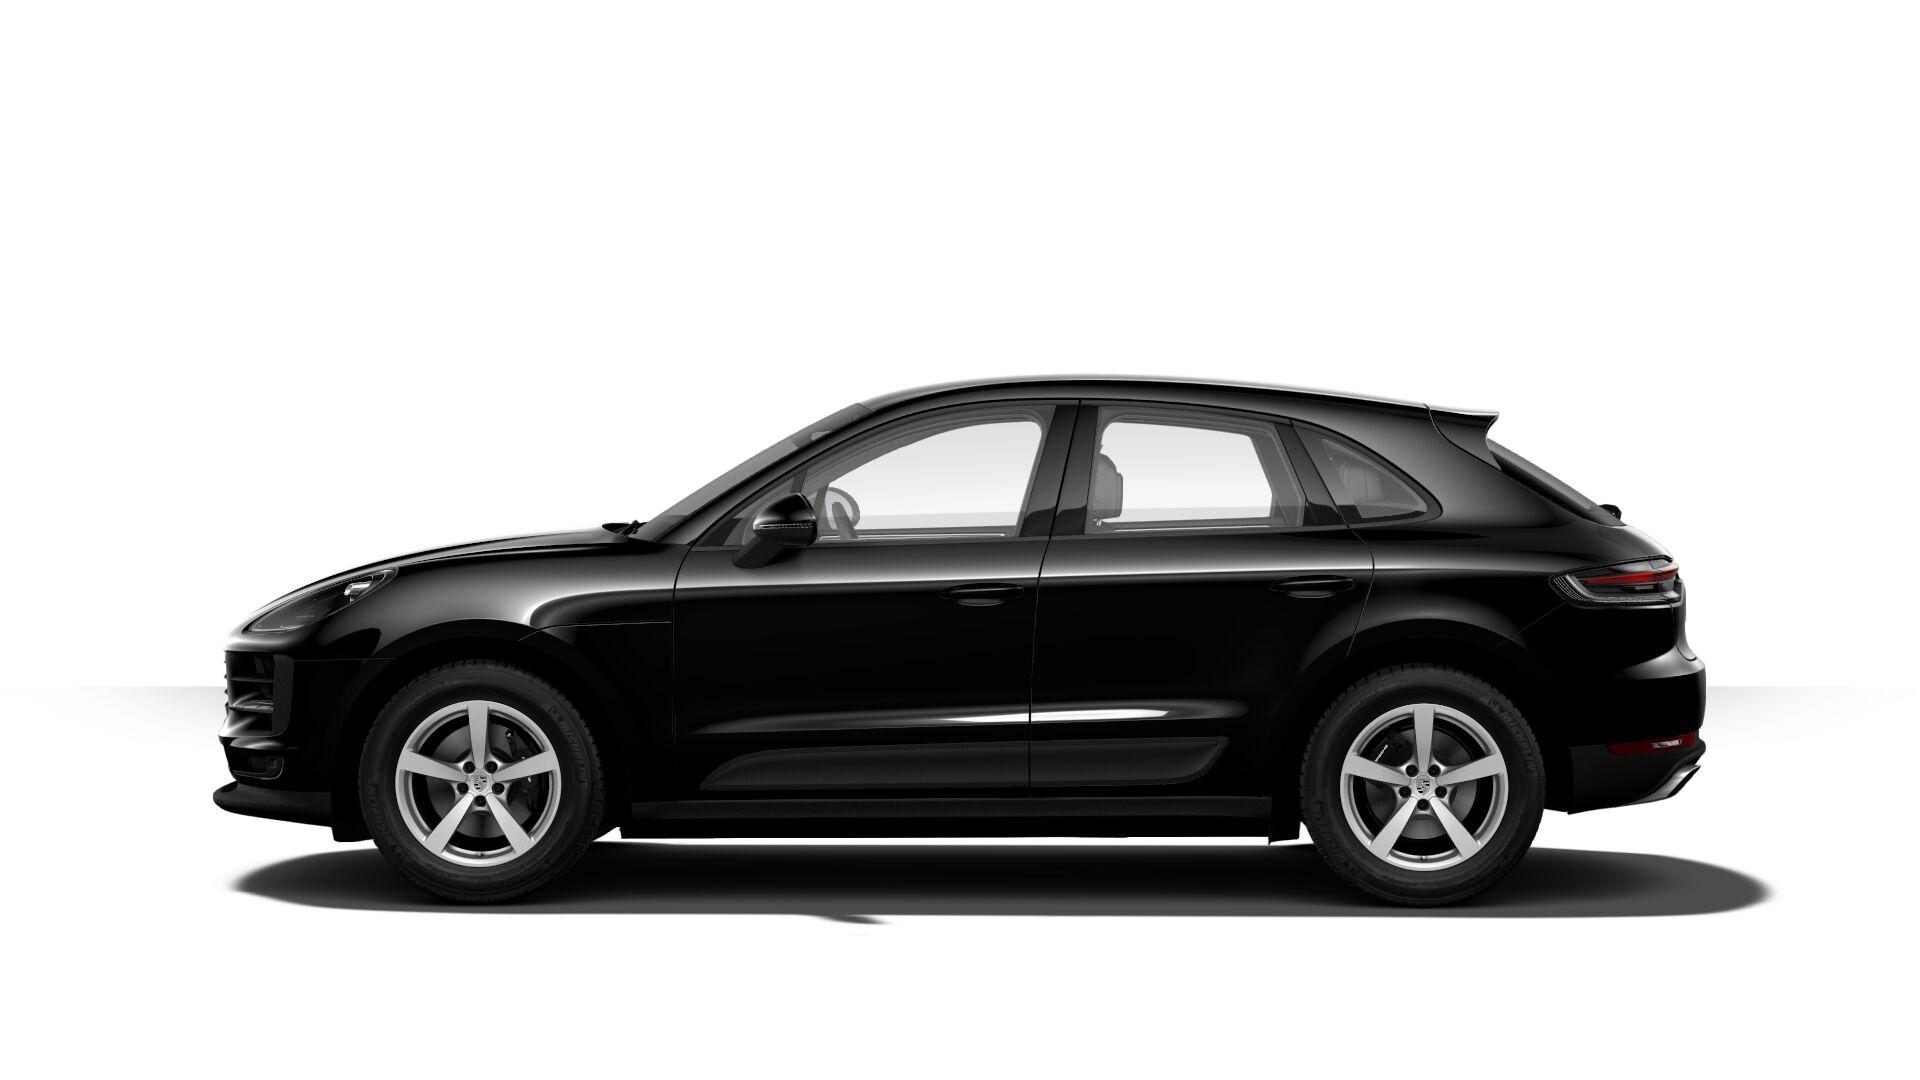 Porsche-Macan-czarny-3